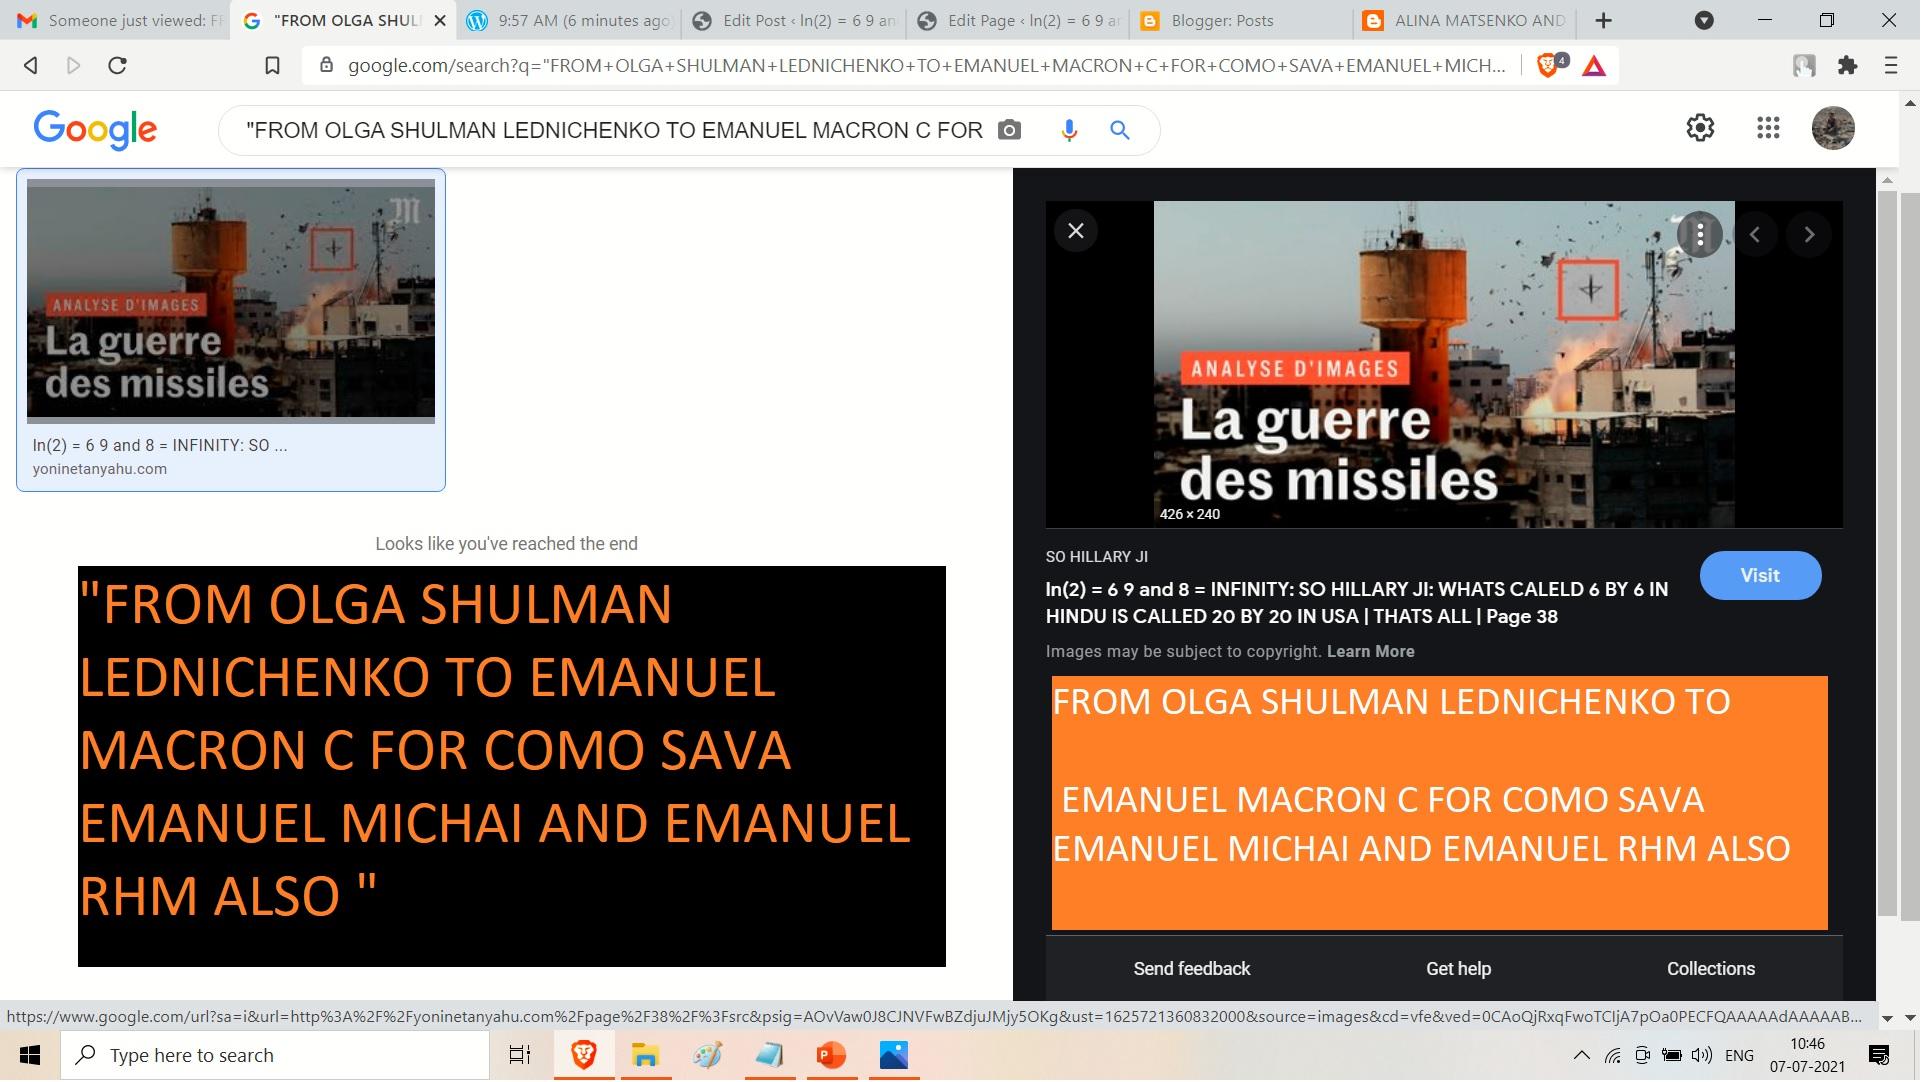 FROM OLGA SHULMAN LEDNICHENKO TO EMANUEL MACRON C FOR COMO SAVA EMANUEL MICHAI AND EMANUEL RHM ALSO